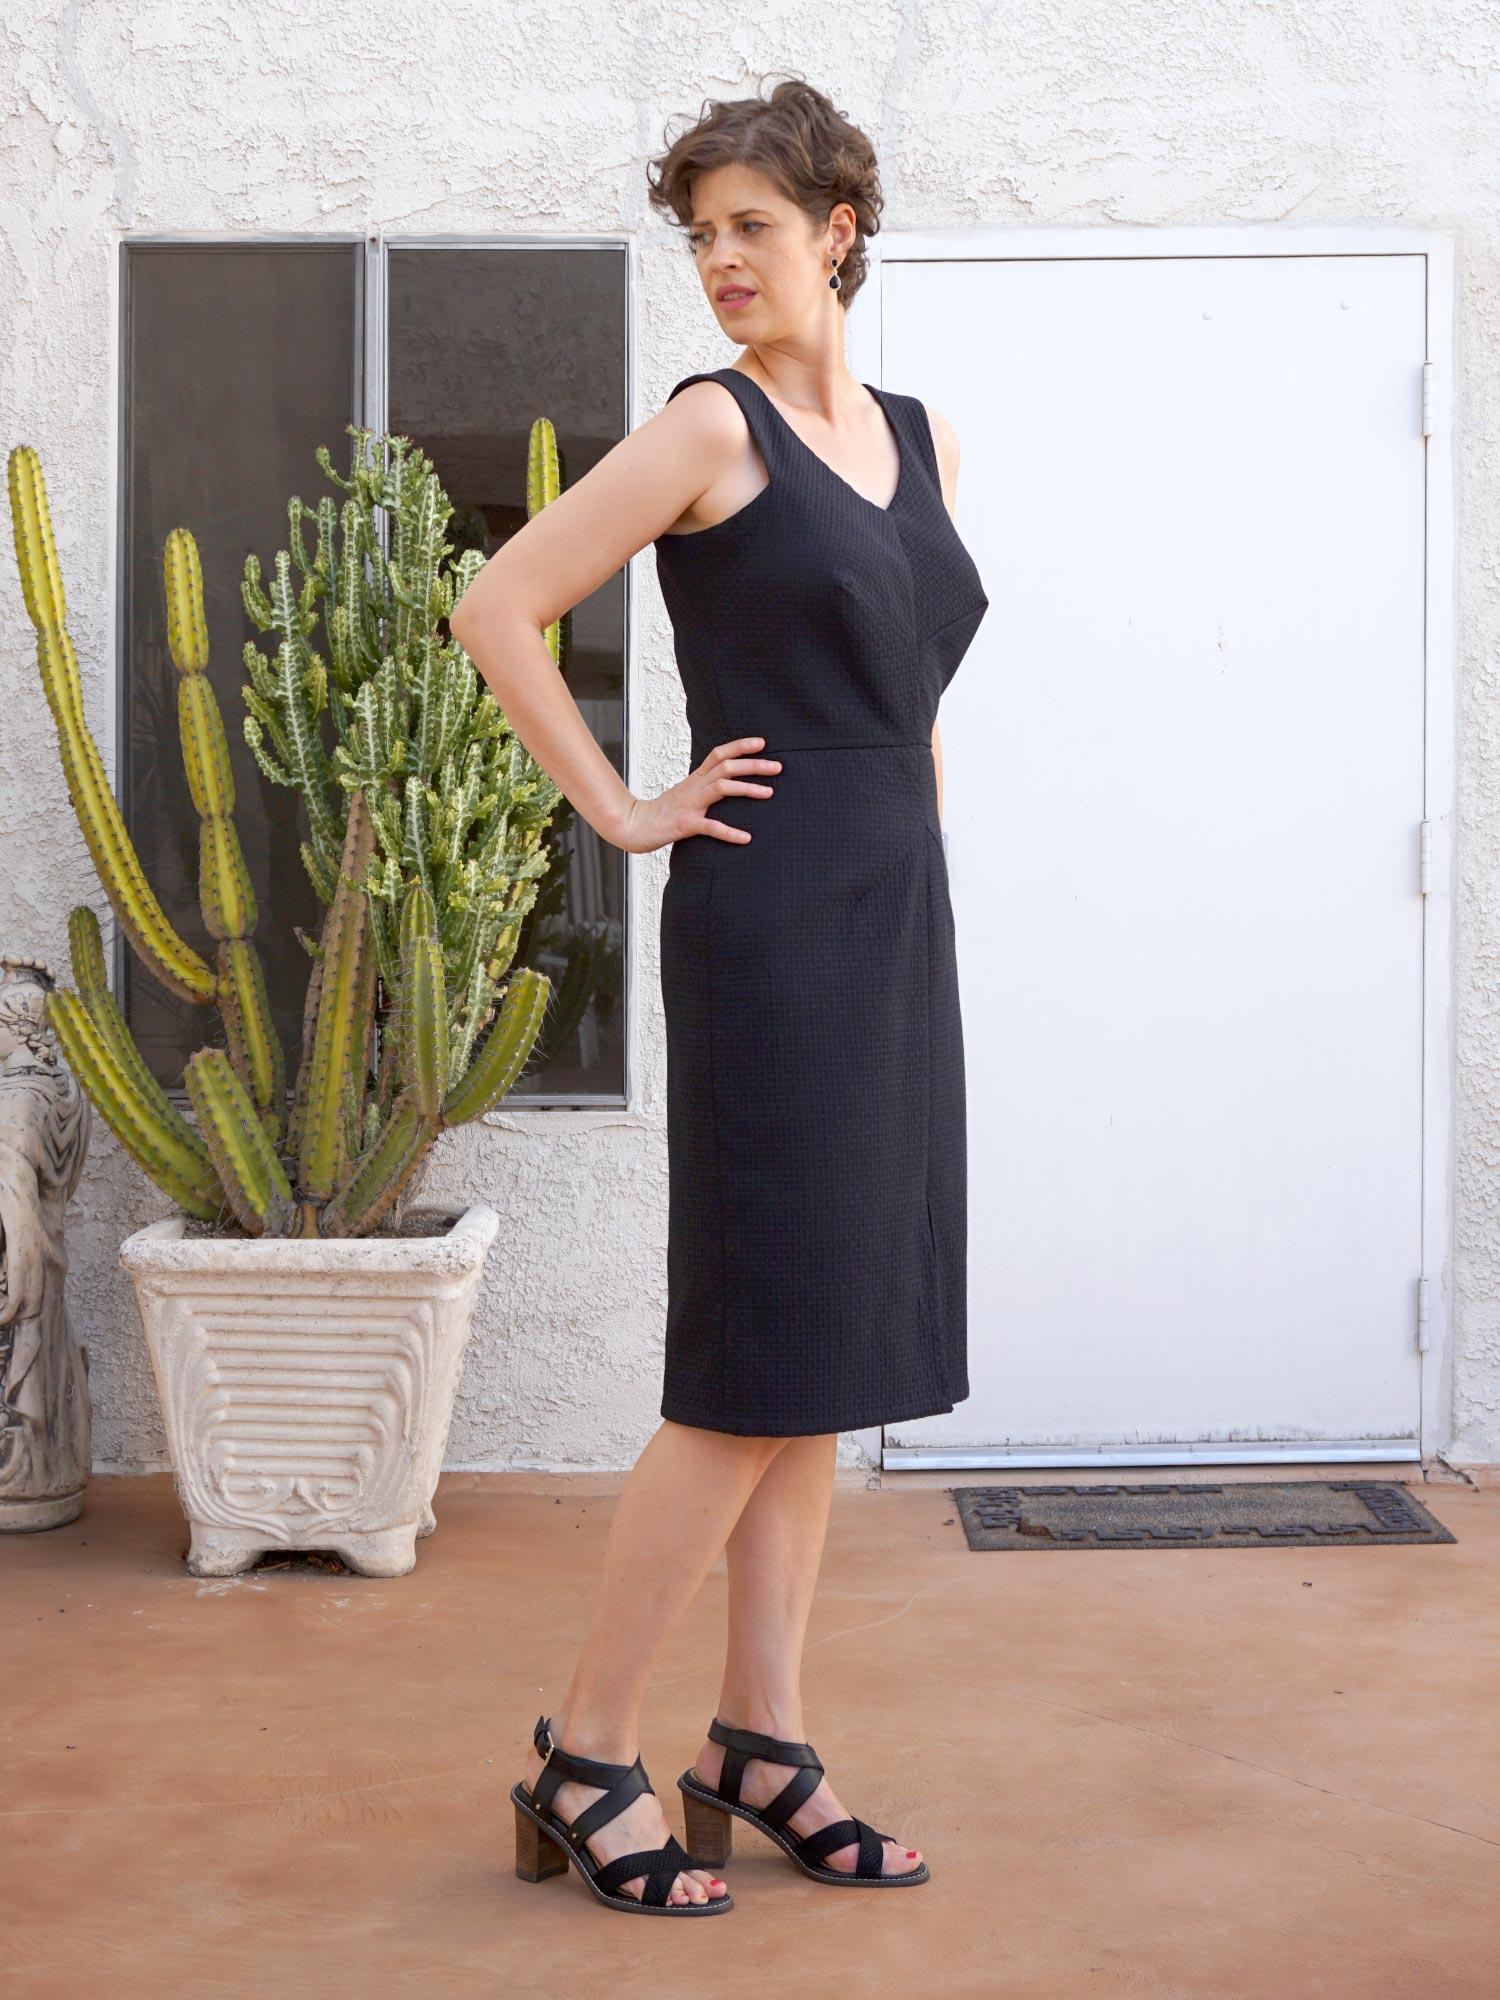 DIY Sheath Dress – Review of the Sophia Dress by By Hand London | Sew DIY